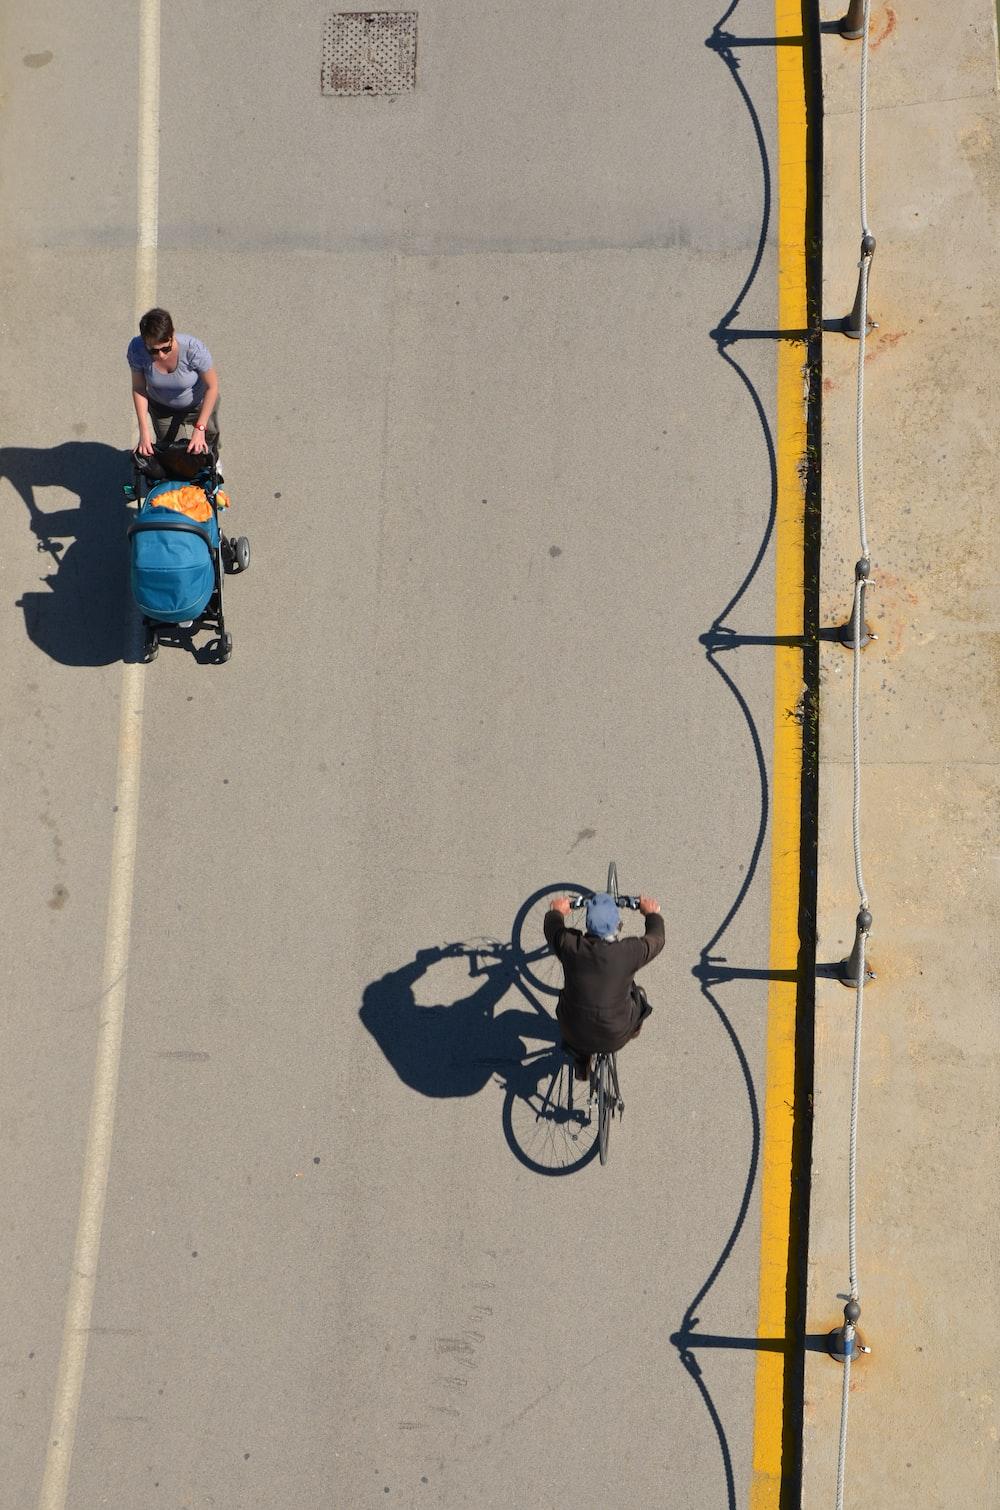 man in blue shirt riding bicycle